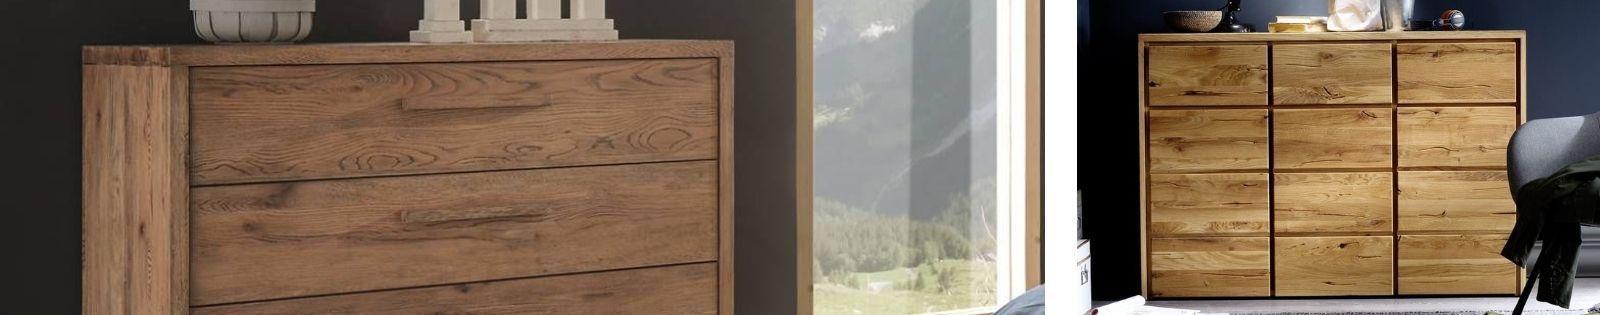 Commode design en bambou, rotin, fer forgé, hêtre, chêne, merisier, noyer massif - Le Monde du Lit